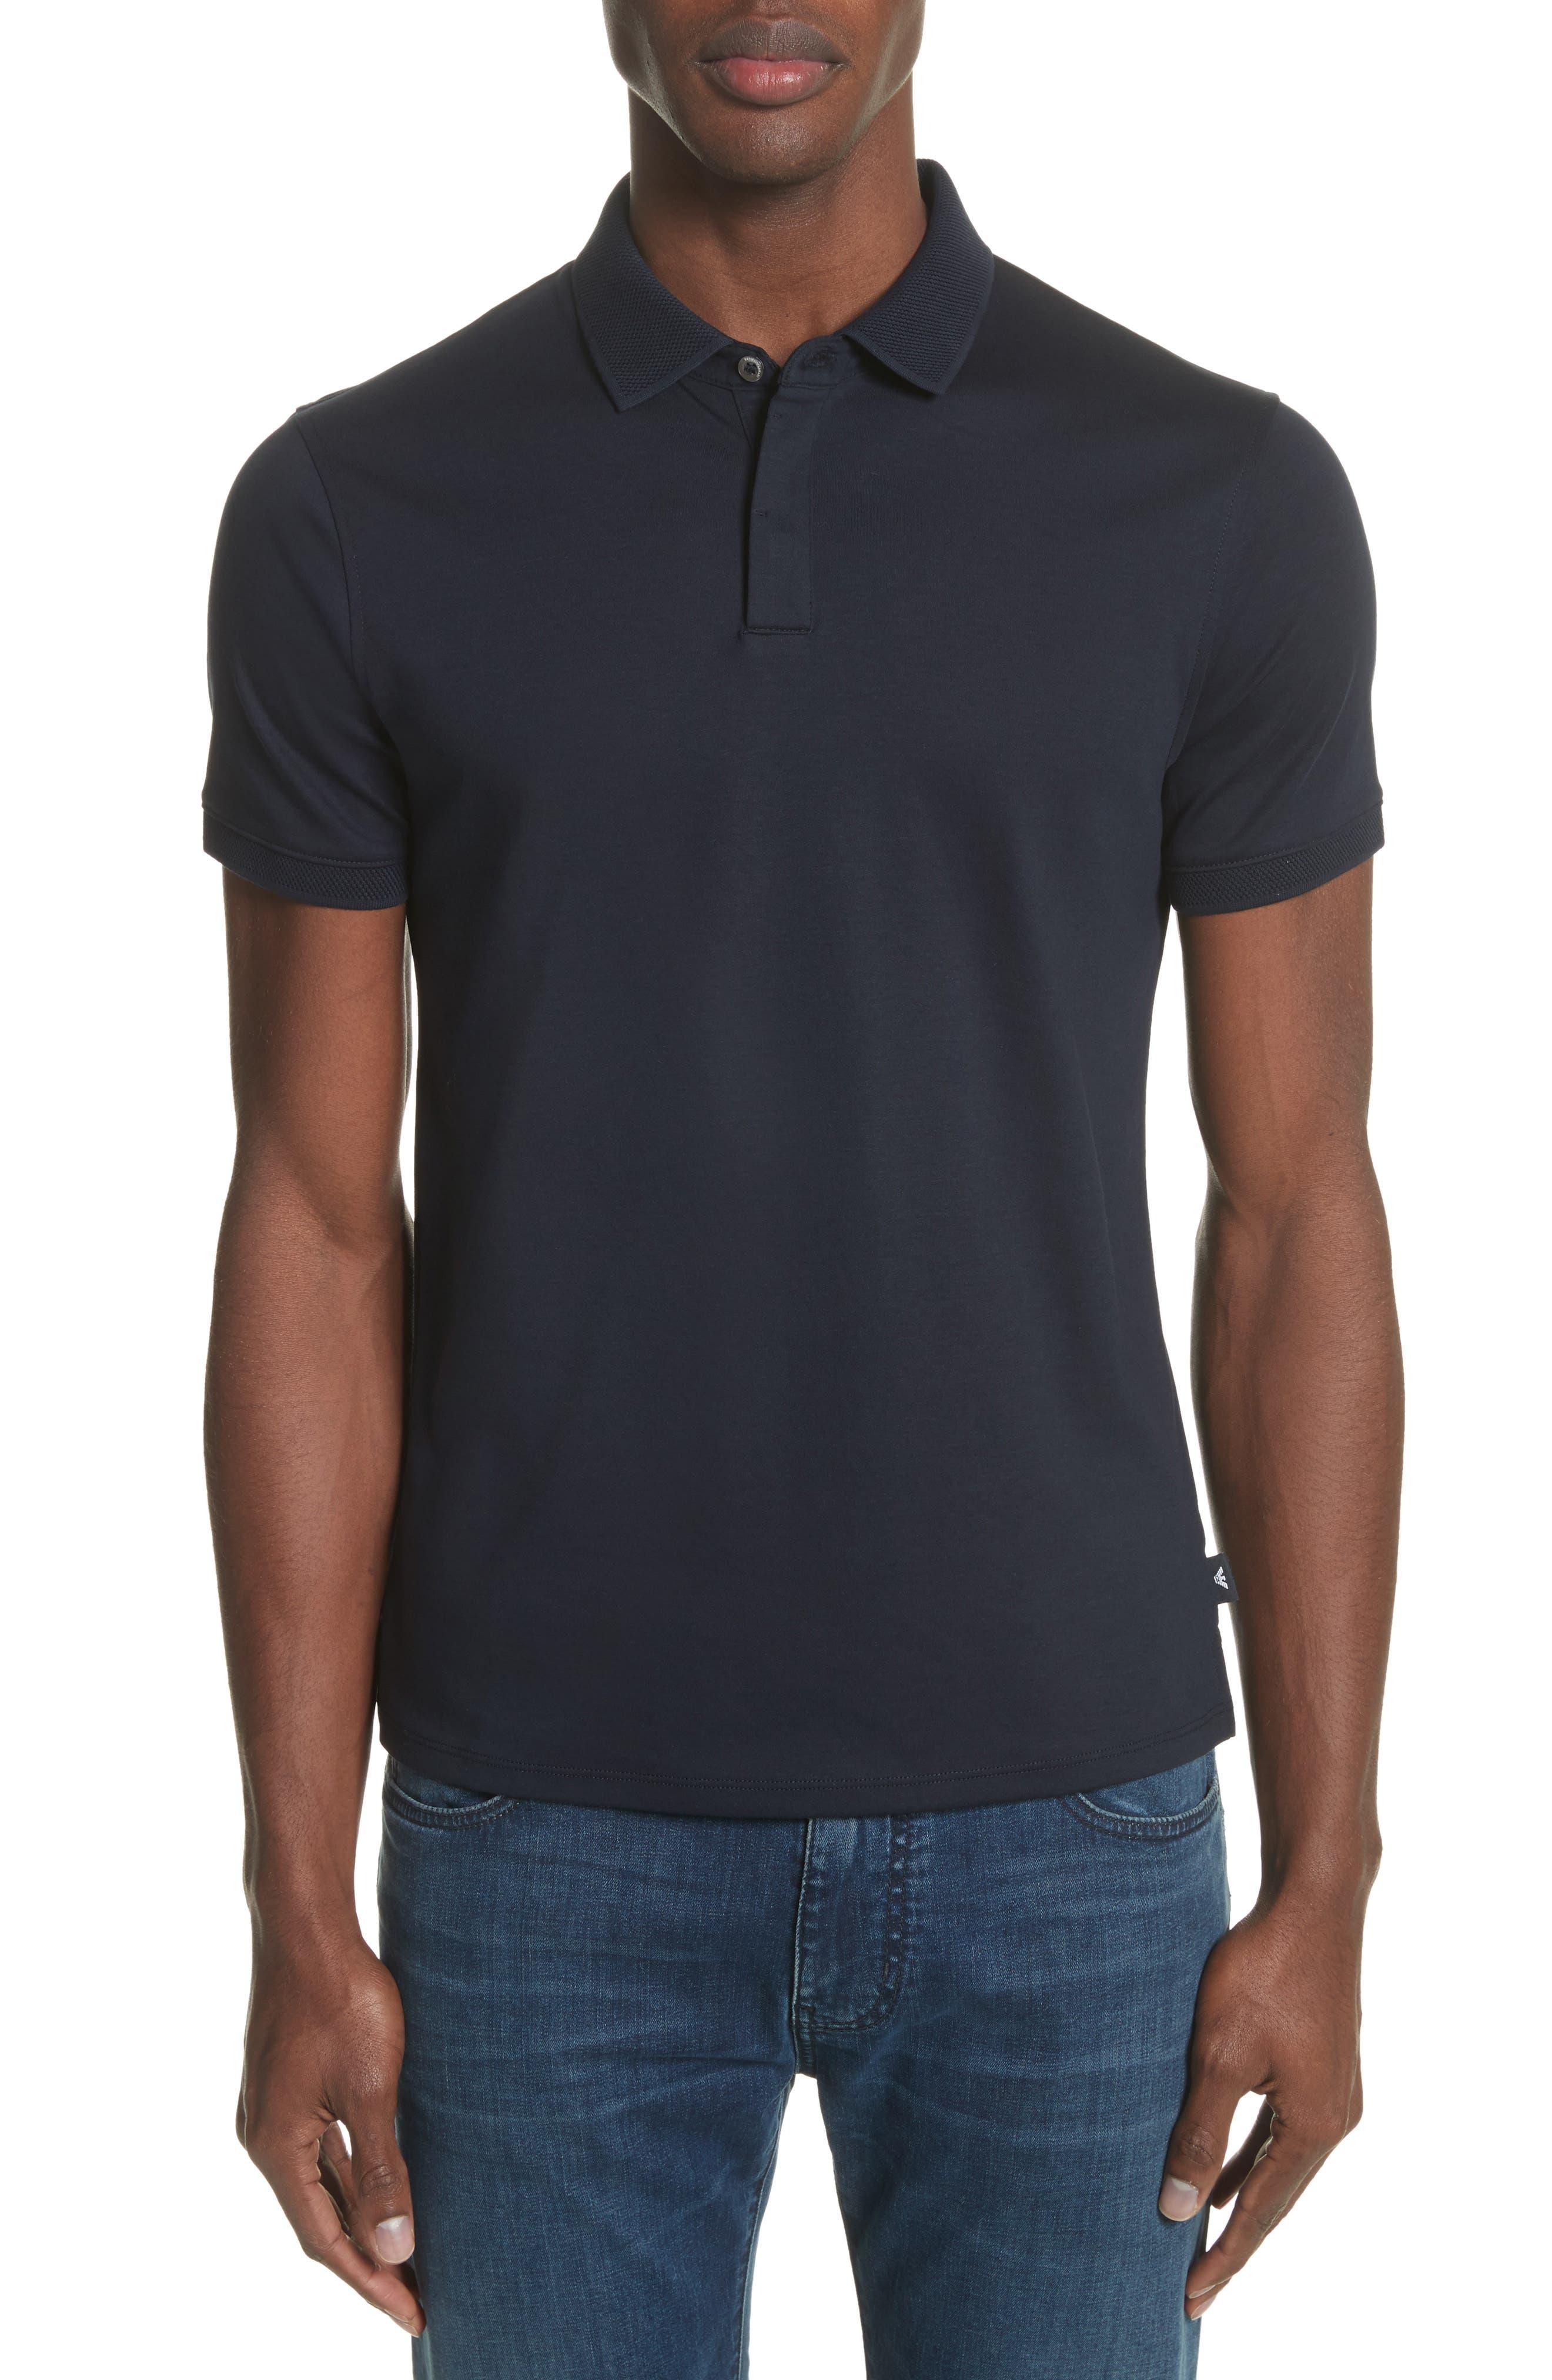 EMPORIO ARMANI Men'S Solid Jersey Polo Shirt in Solid Dark Blue